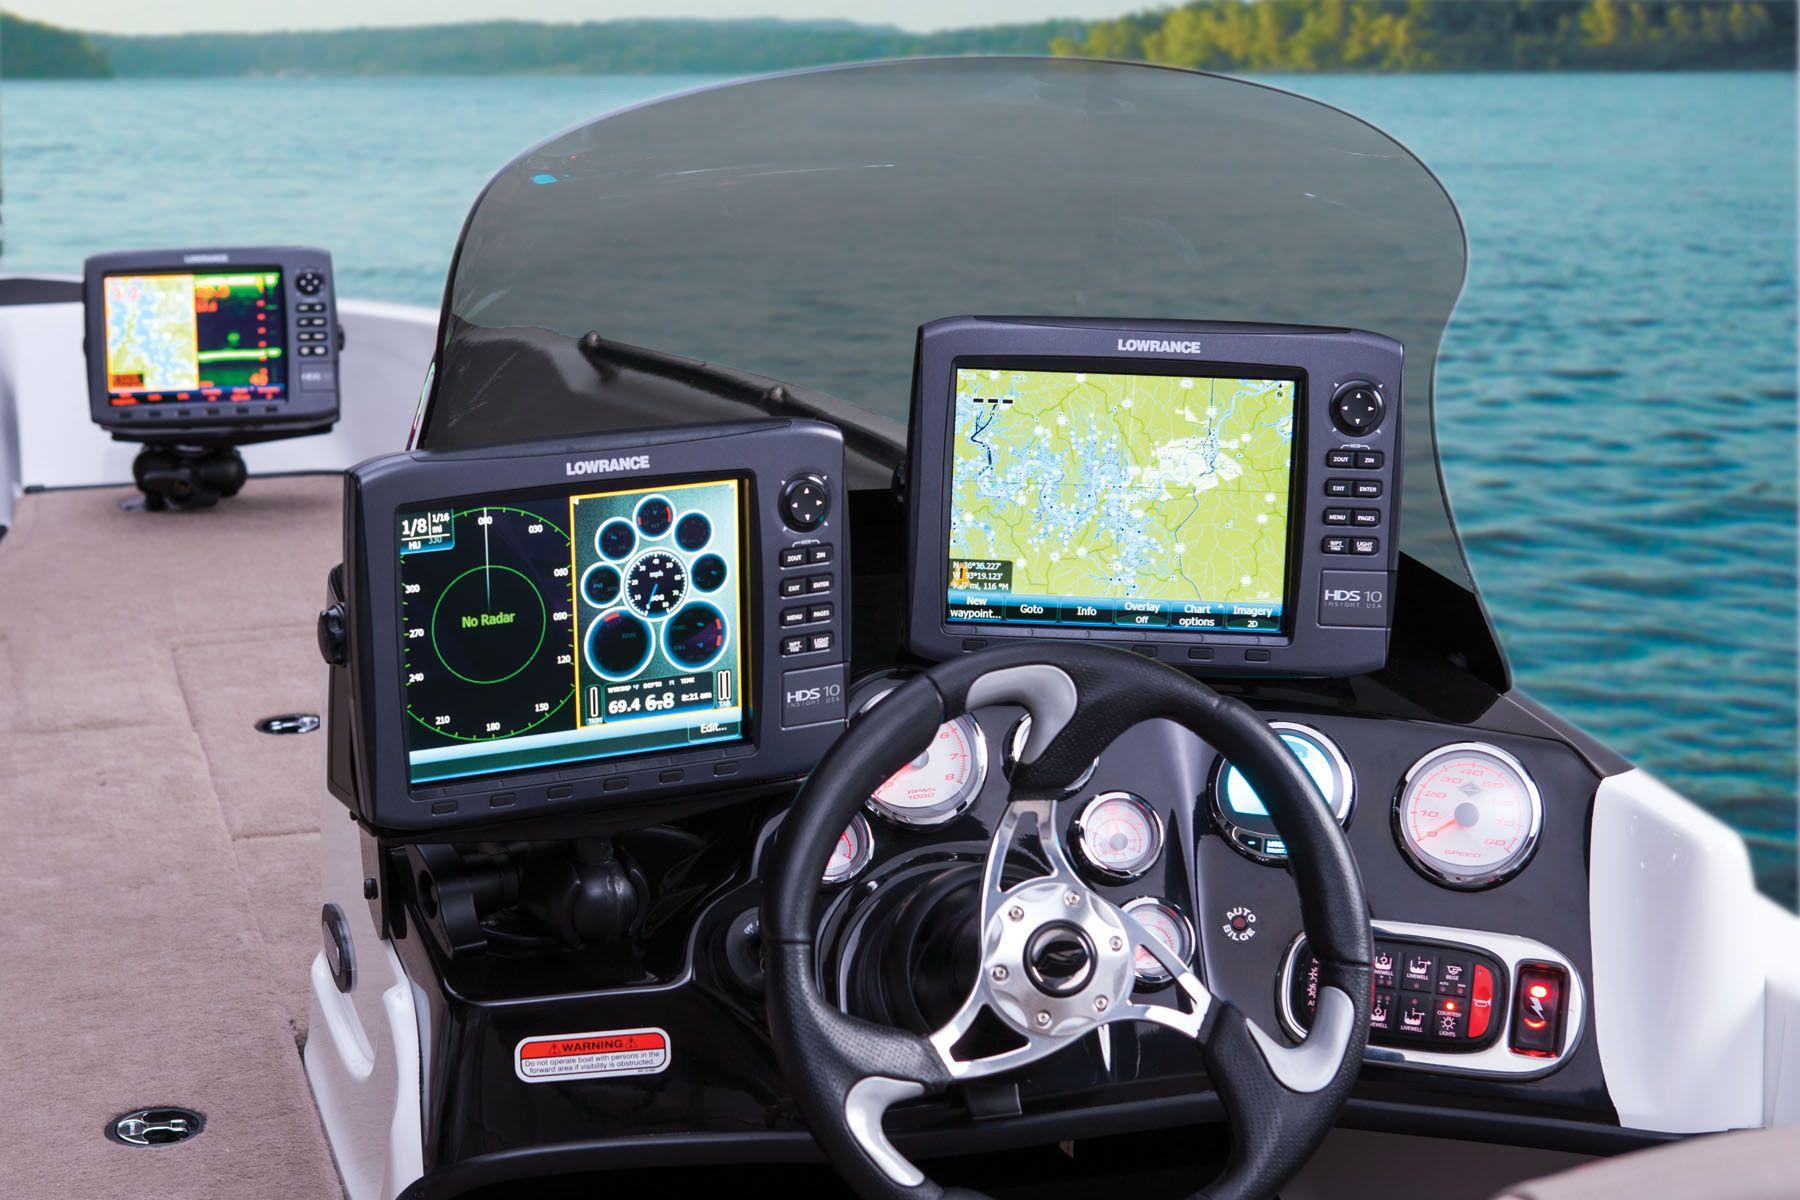 Dual consoles wlowrance hd fishfinder wgps easyto